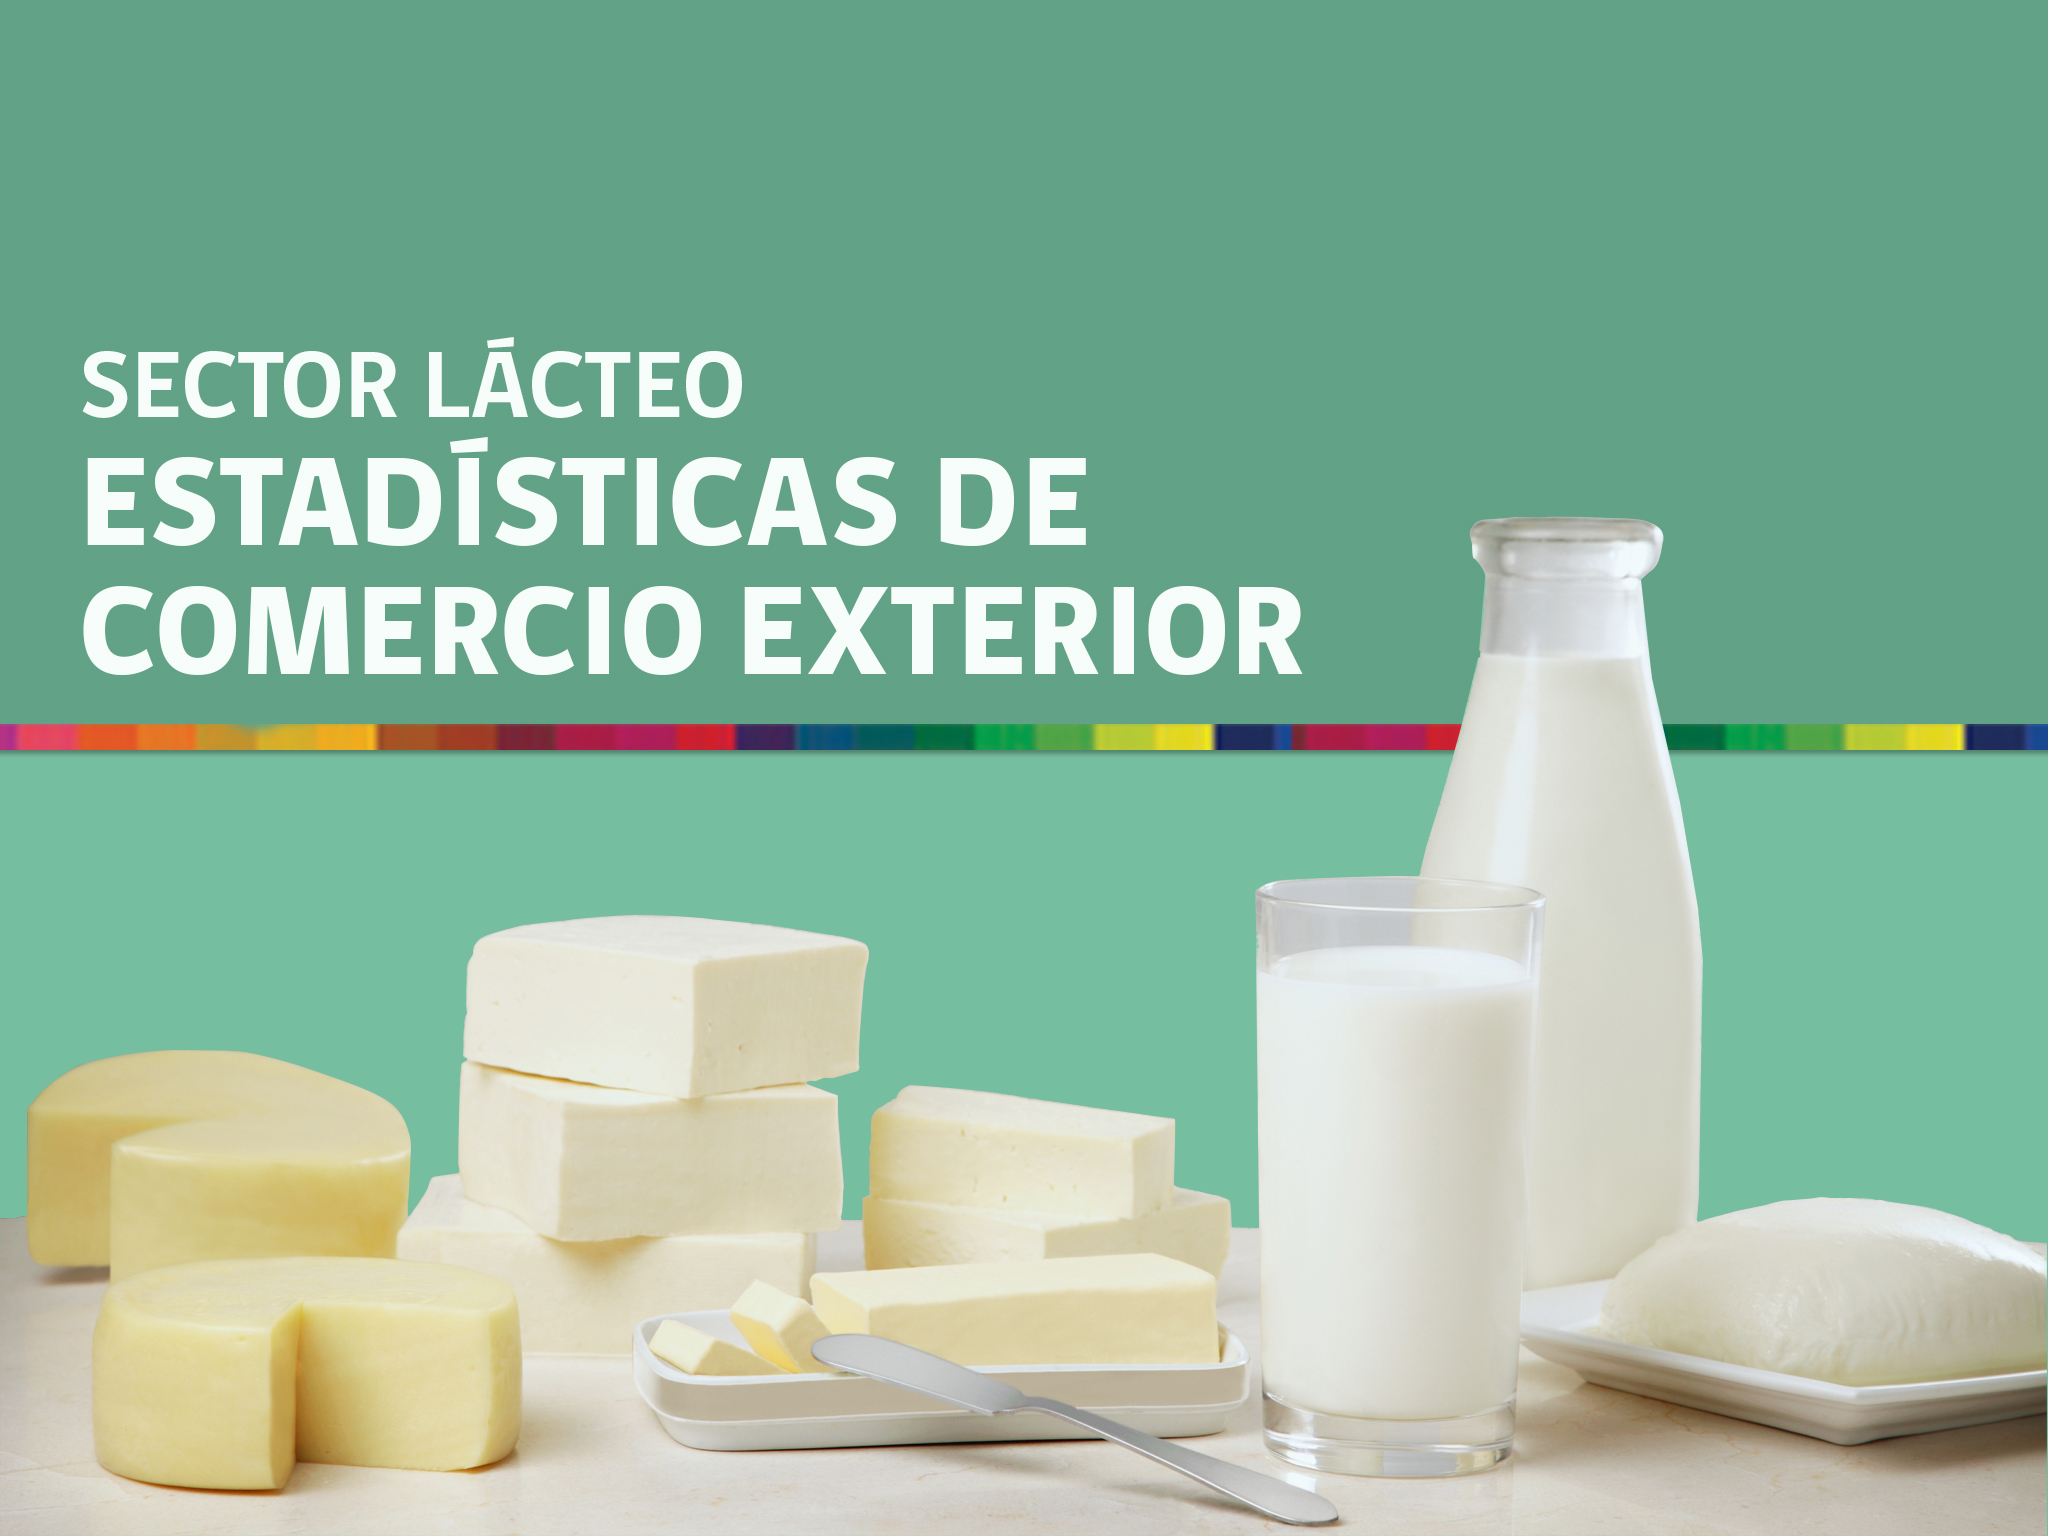 Boletín sector lácteo: estadísticas de comercio exterior